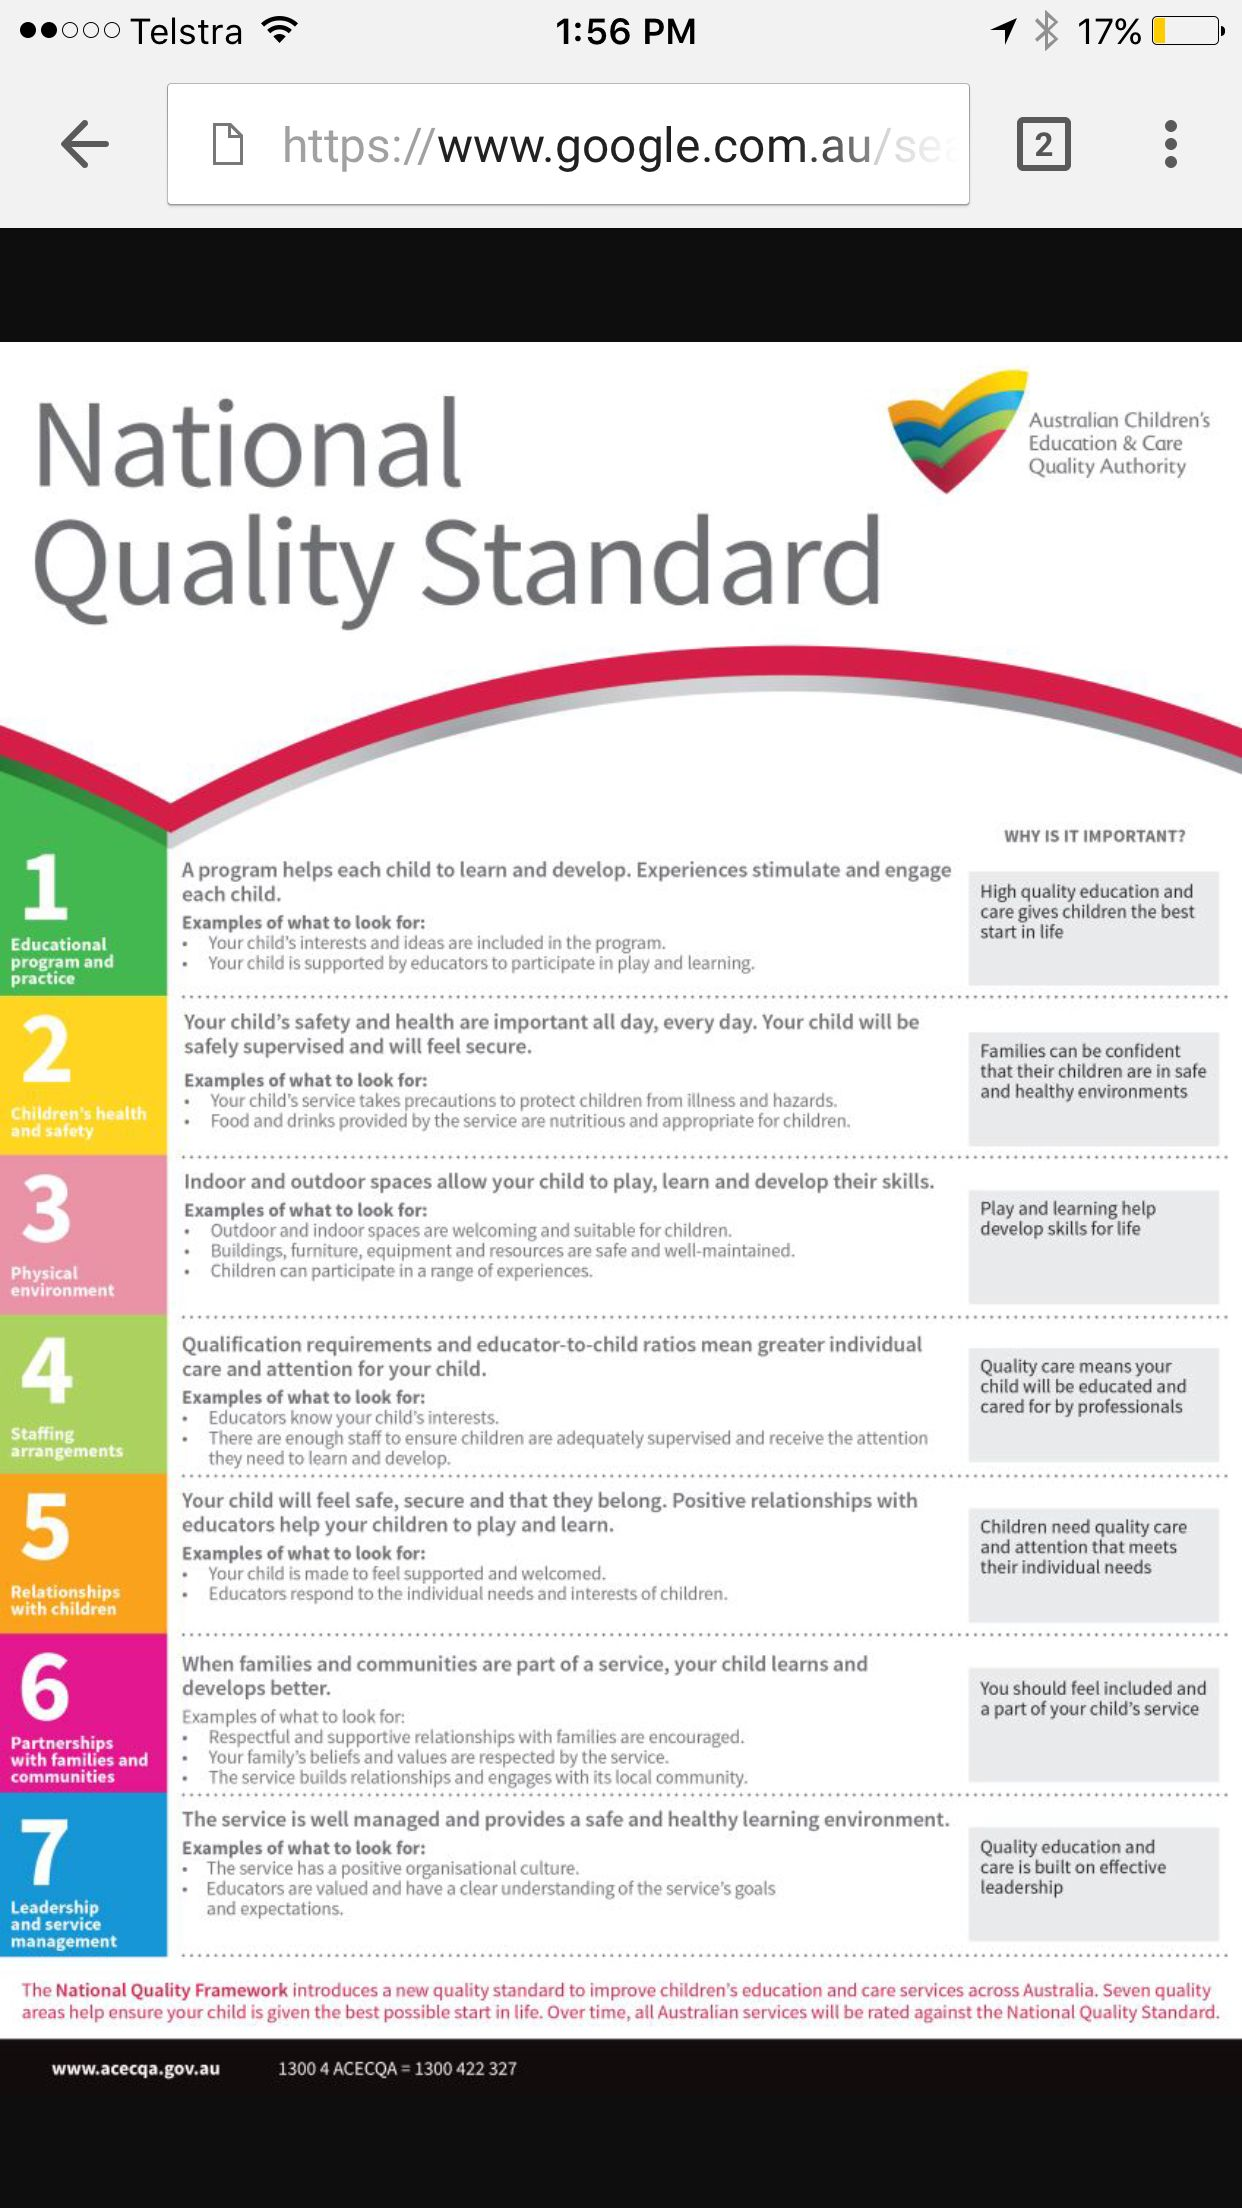 National Quality Standard - 7 quality areas | Pinterest- Frameworks